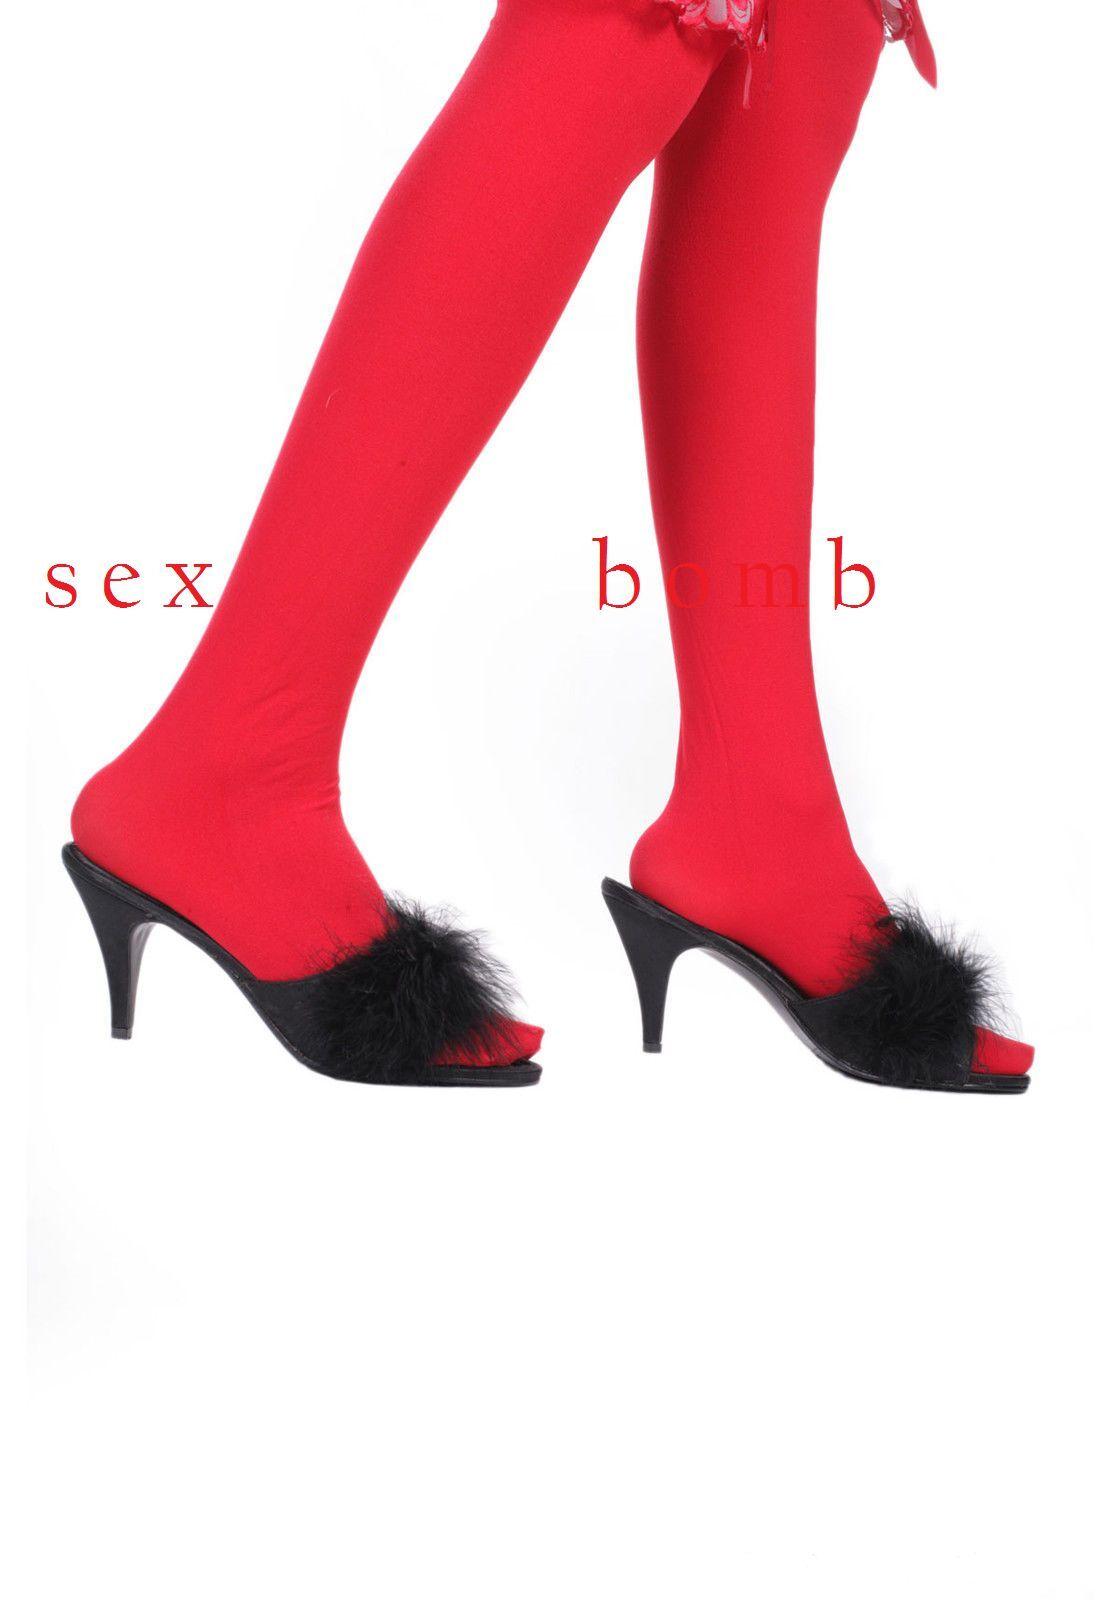 SEXY da marylin sabot Sandale neri da SEXY camera tacco 7,5 dal numero 35 al 46 GLAMOUR dbf679